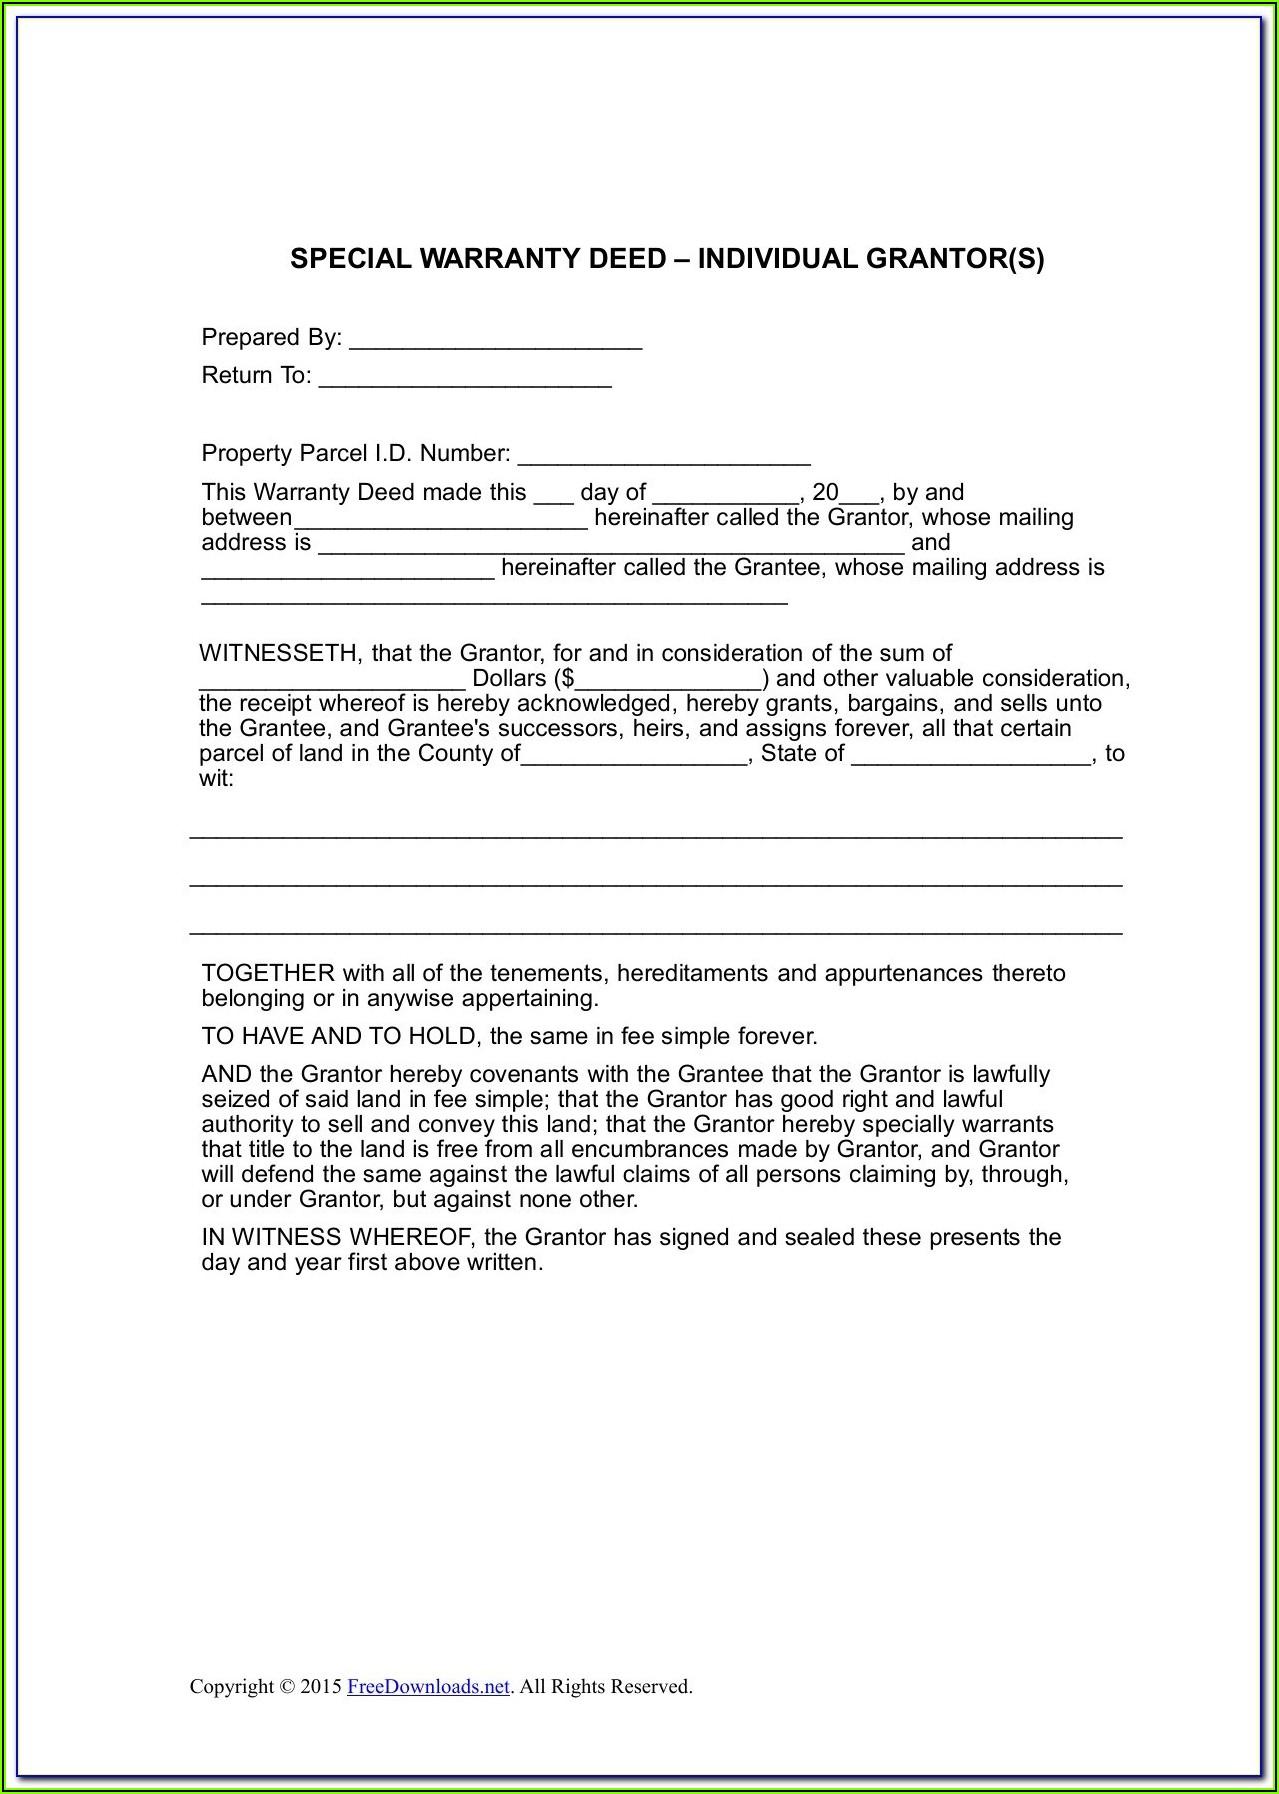 Warranty Deed Document